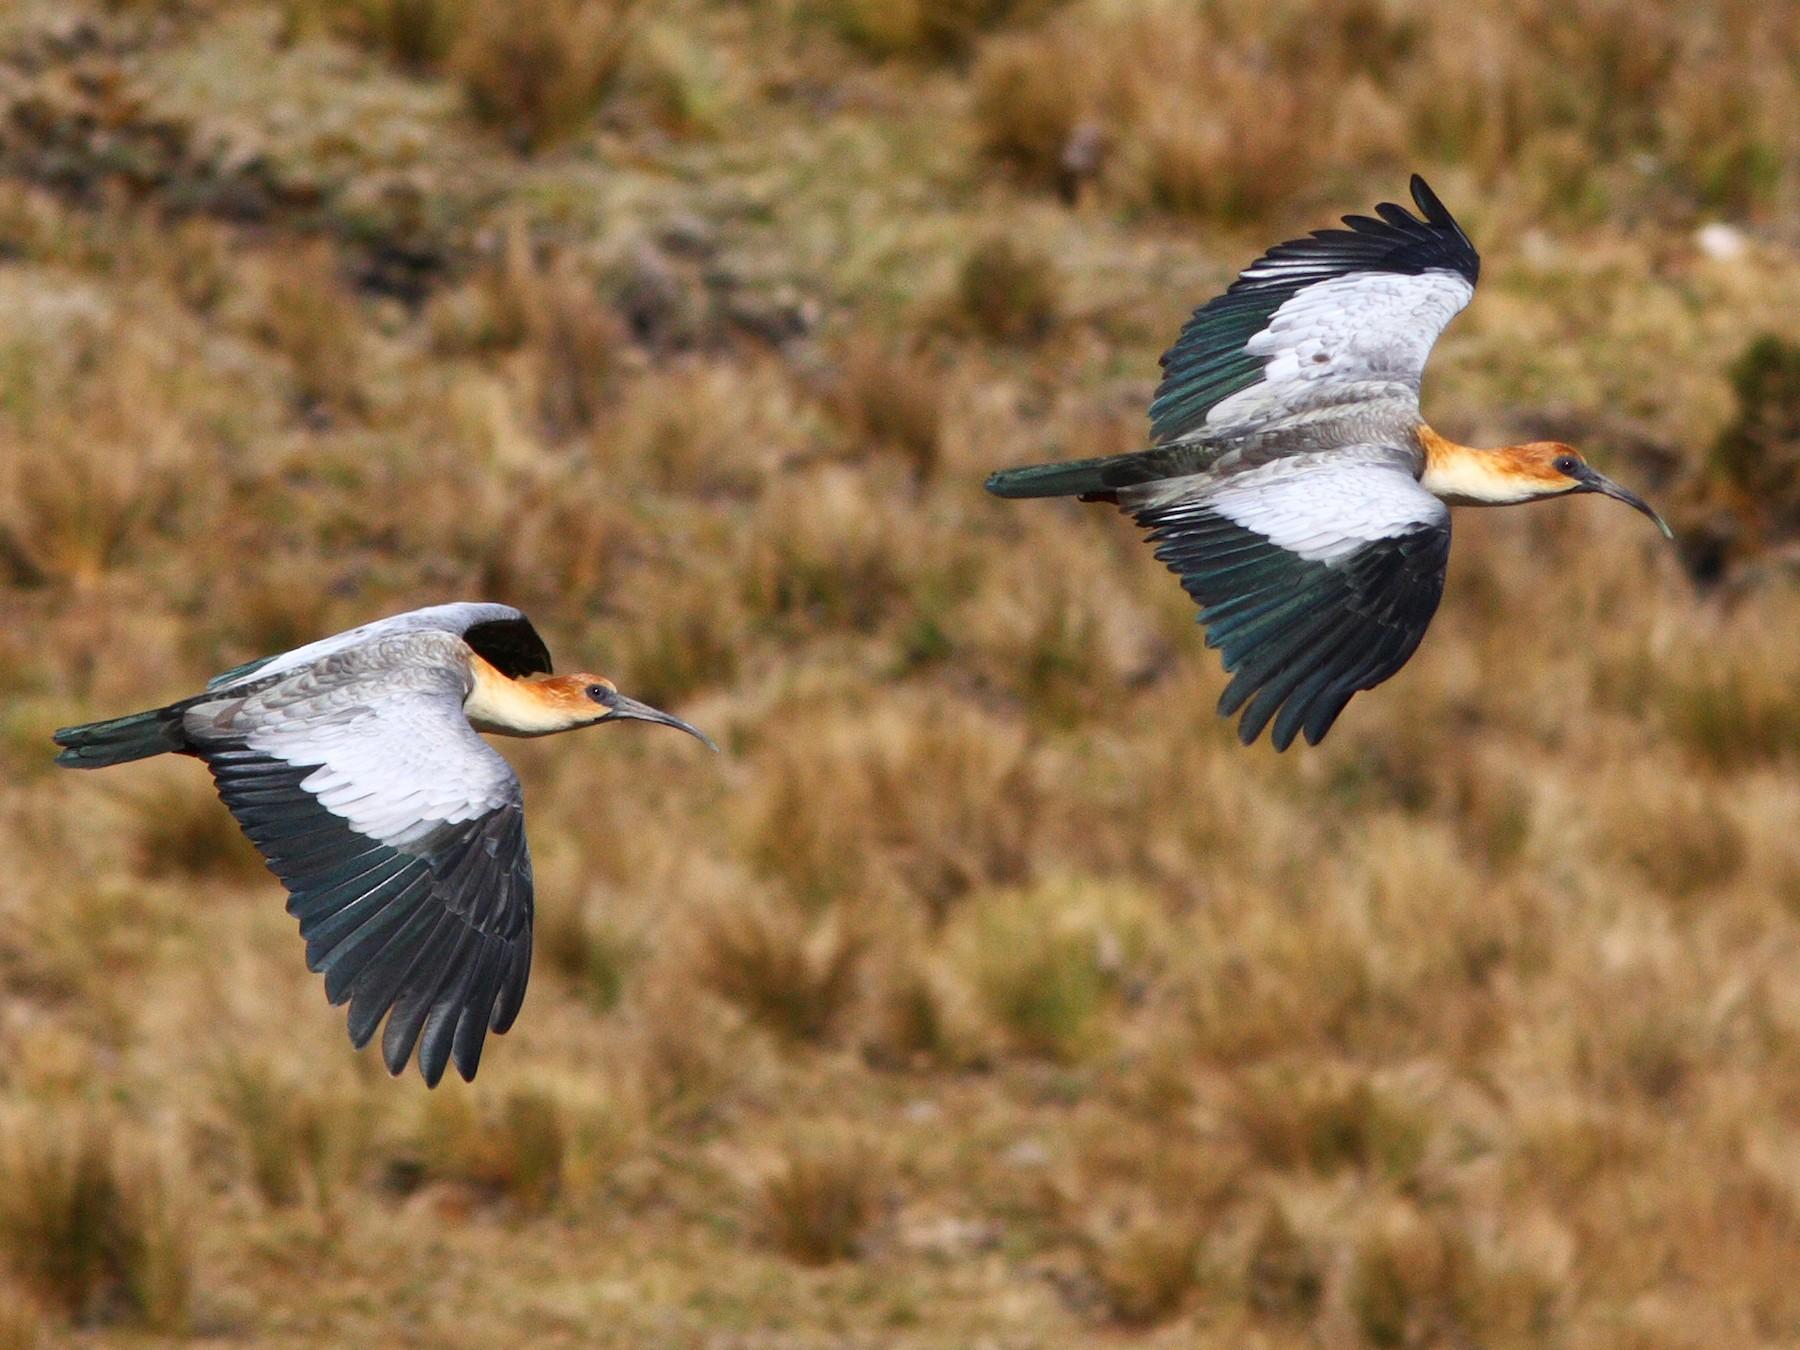 Black-faced/Andean Ibis - David Disher